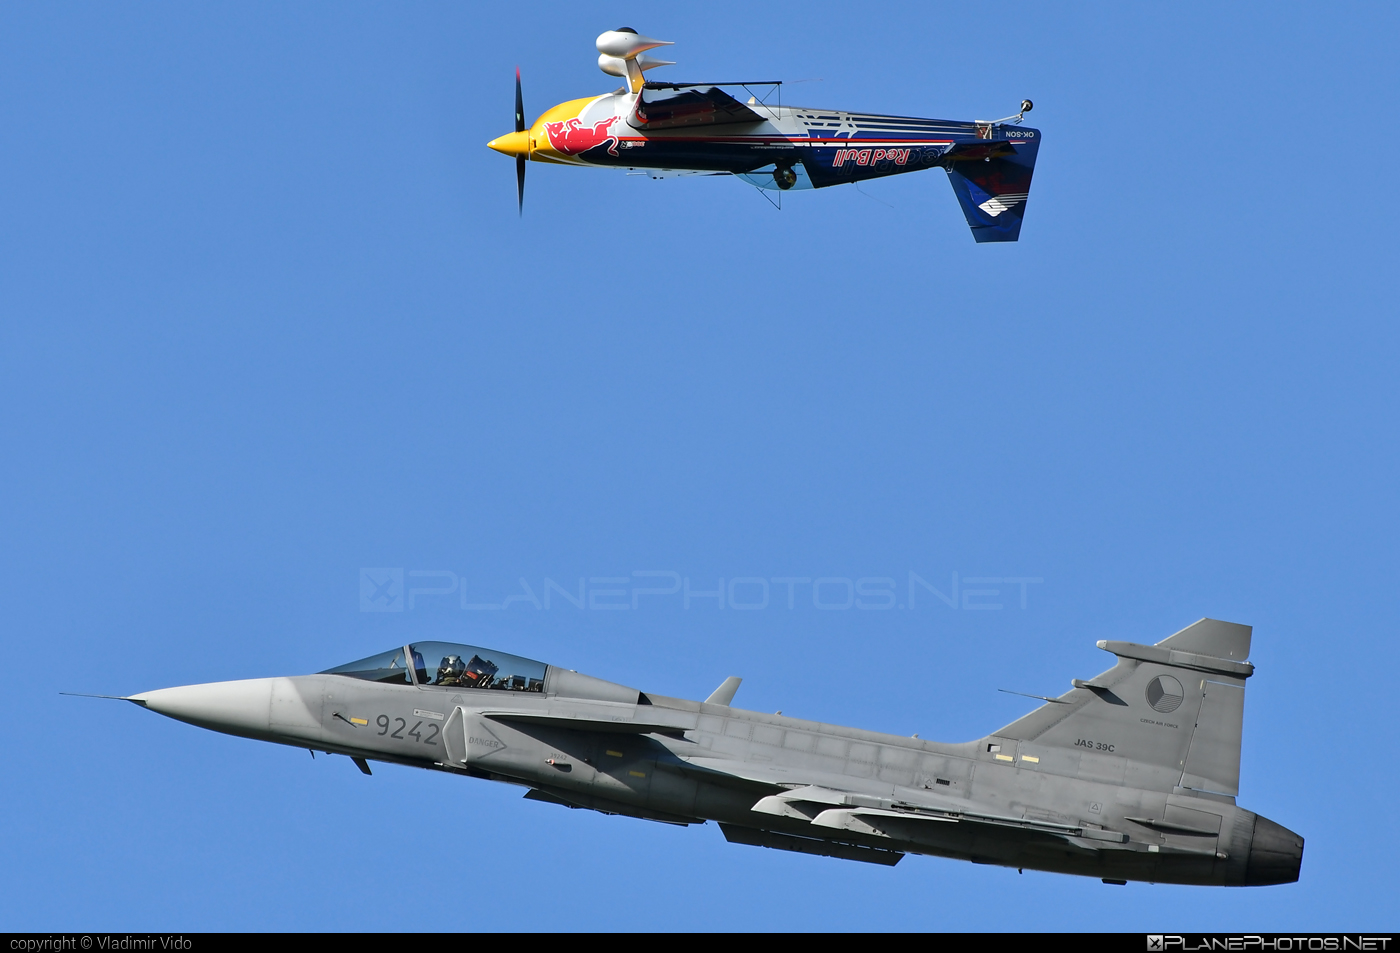 Saab JAS 39C Gripen - 9242 operated by Vzdušné síly AČR (Czech Air Force) #czechairforce #gripen #jas39 #jas39c #jas39gripen #natodays #natodays2019 #saab #vzdusnesilyacr